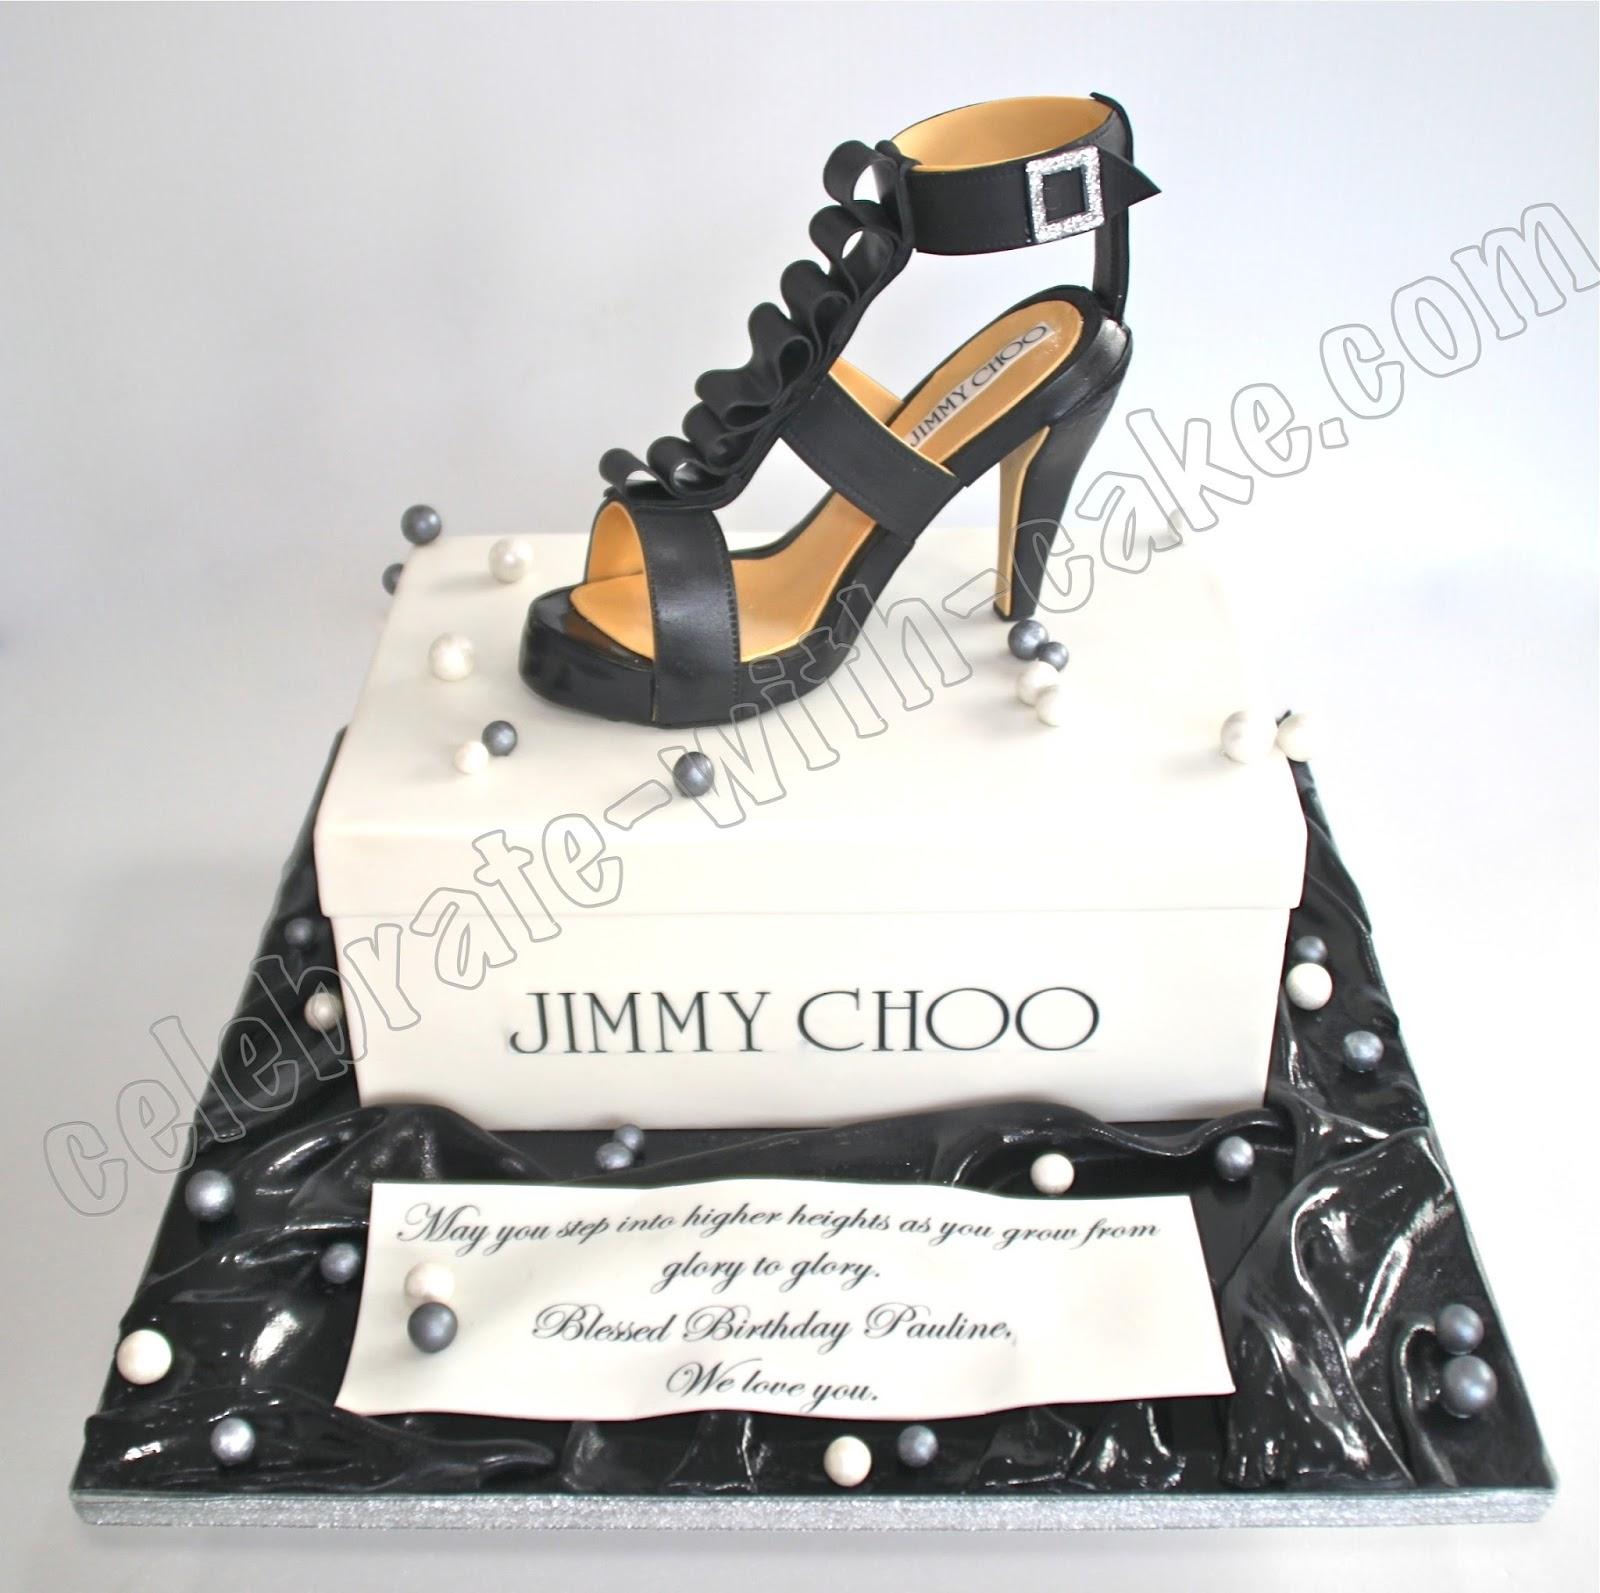 Celebrate With Cake Jimmy Choo High Heeled Shoe Cake